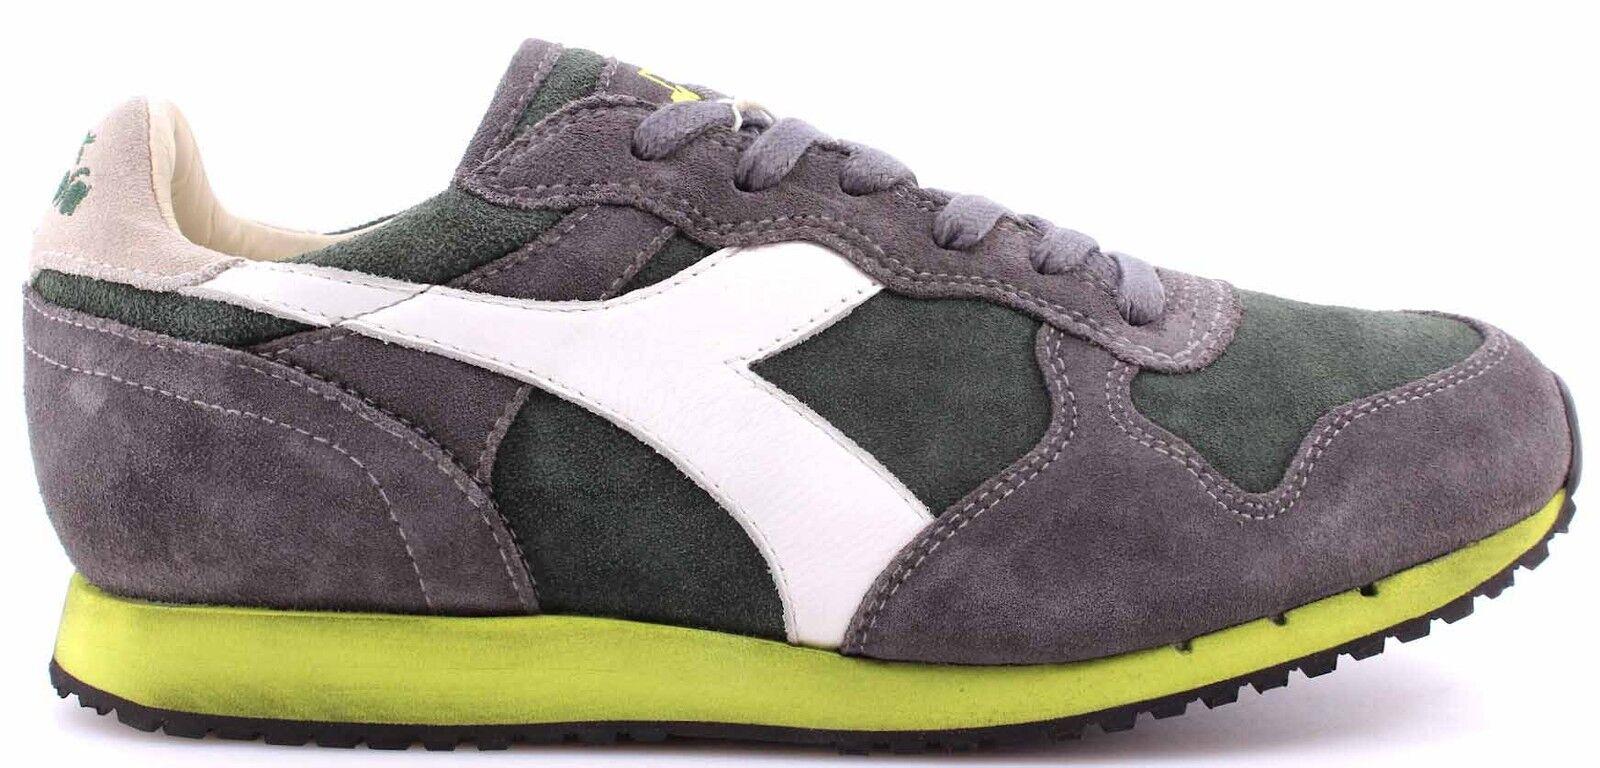 DIADORA HERITAGE Scarpe Sneakers Uomo Trident Vintage Foliage Green Castle Rock Vintage Trident 594130